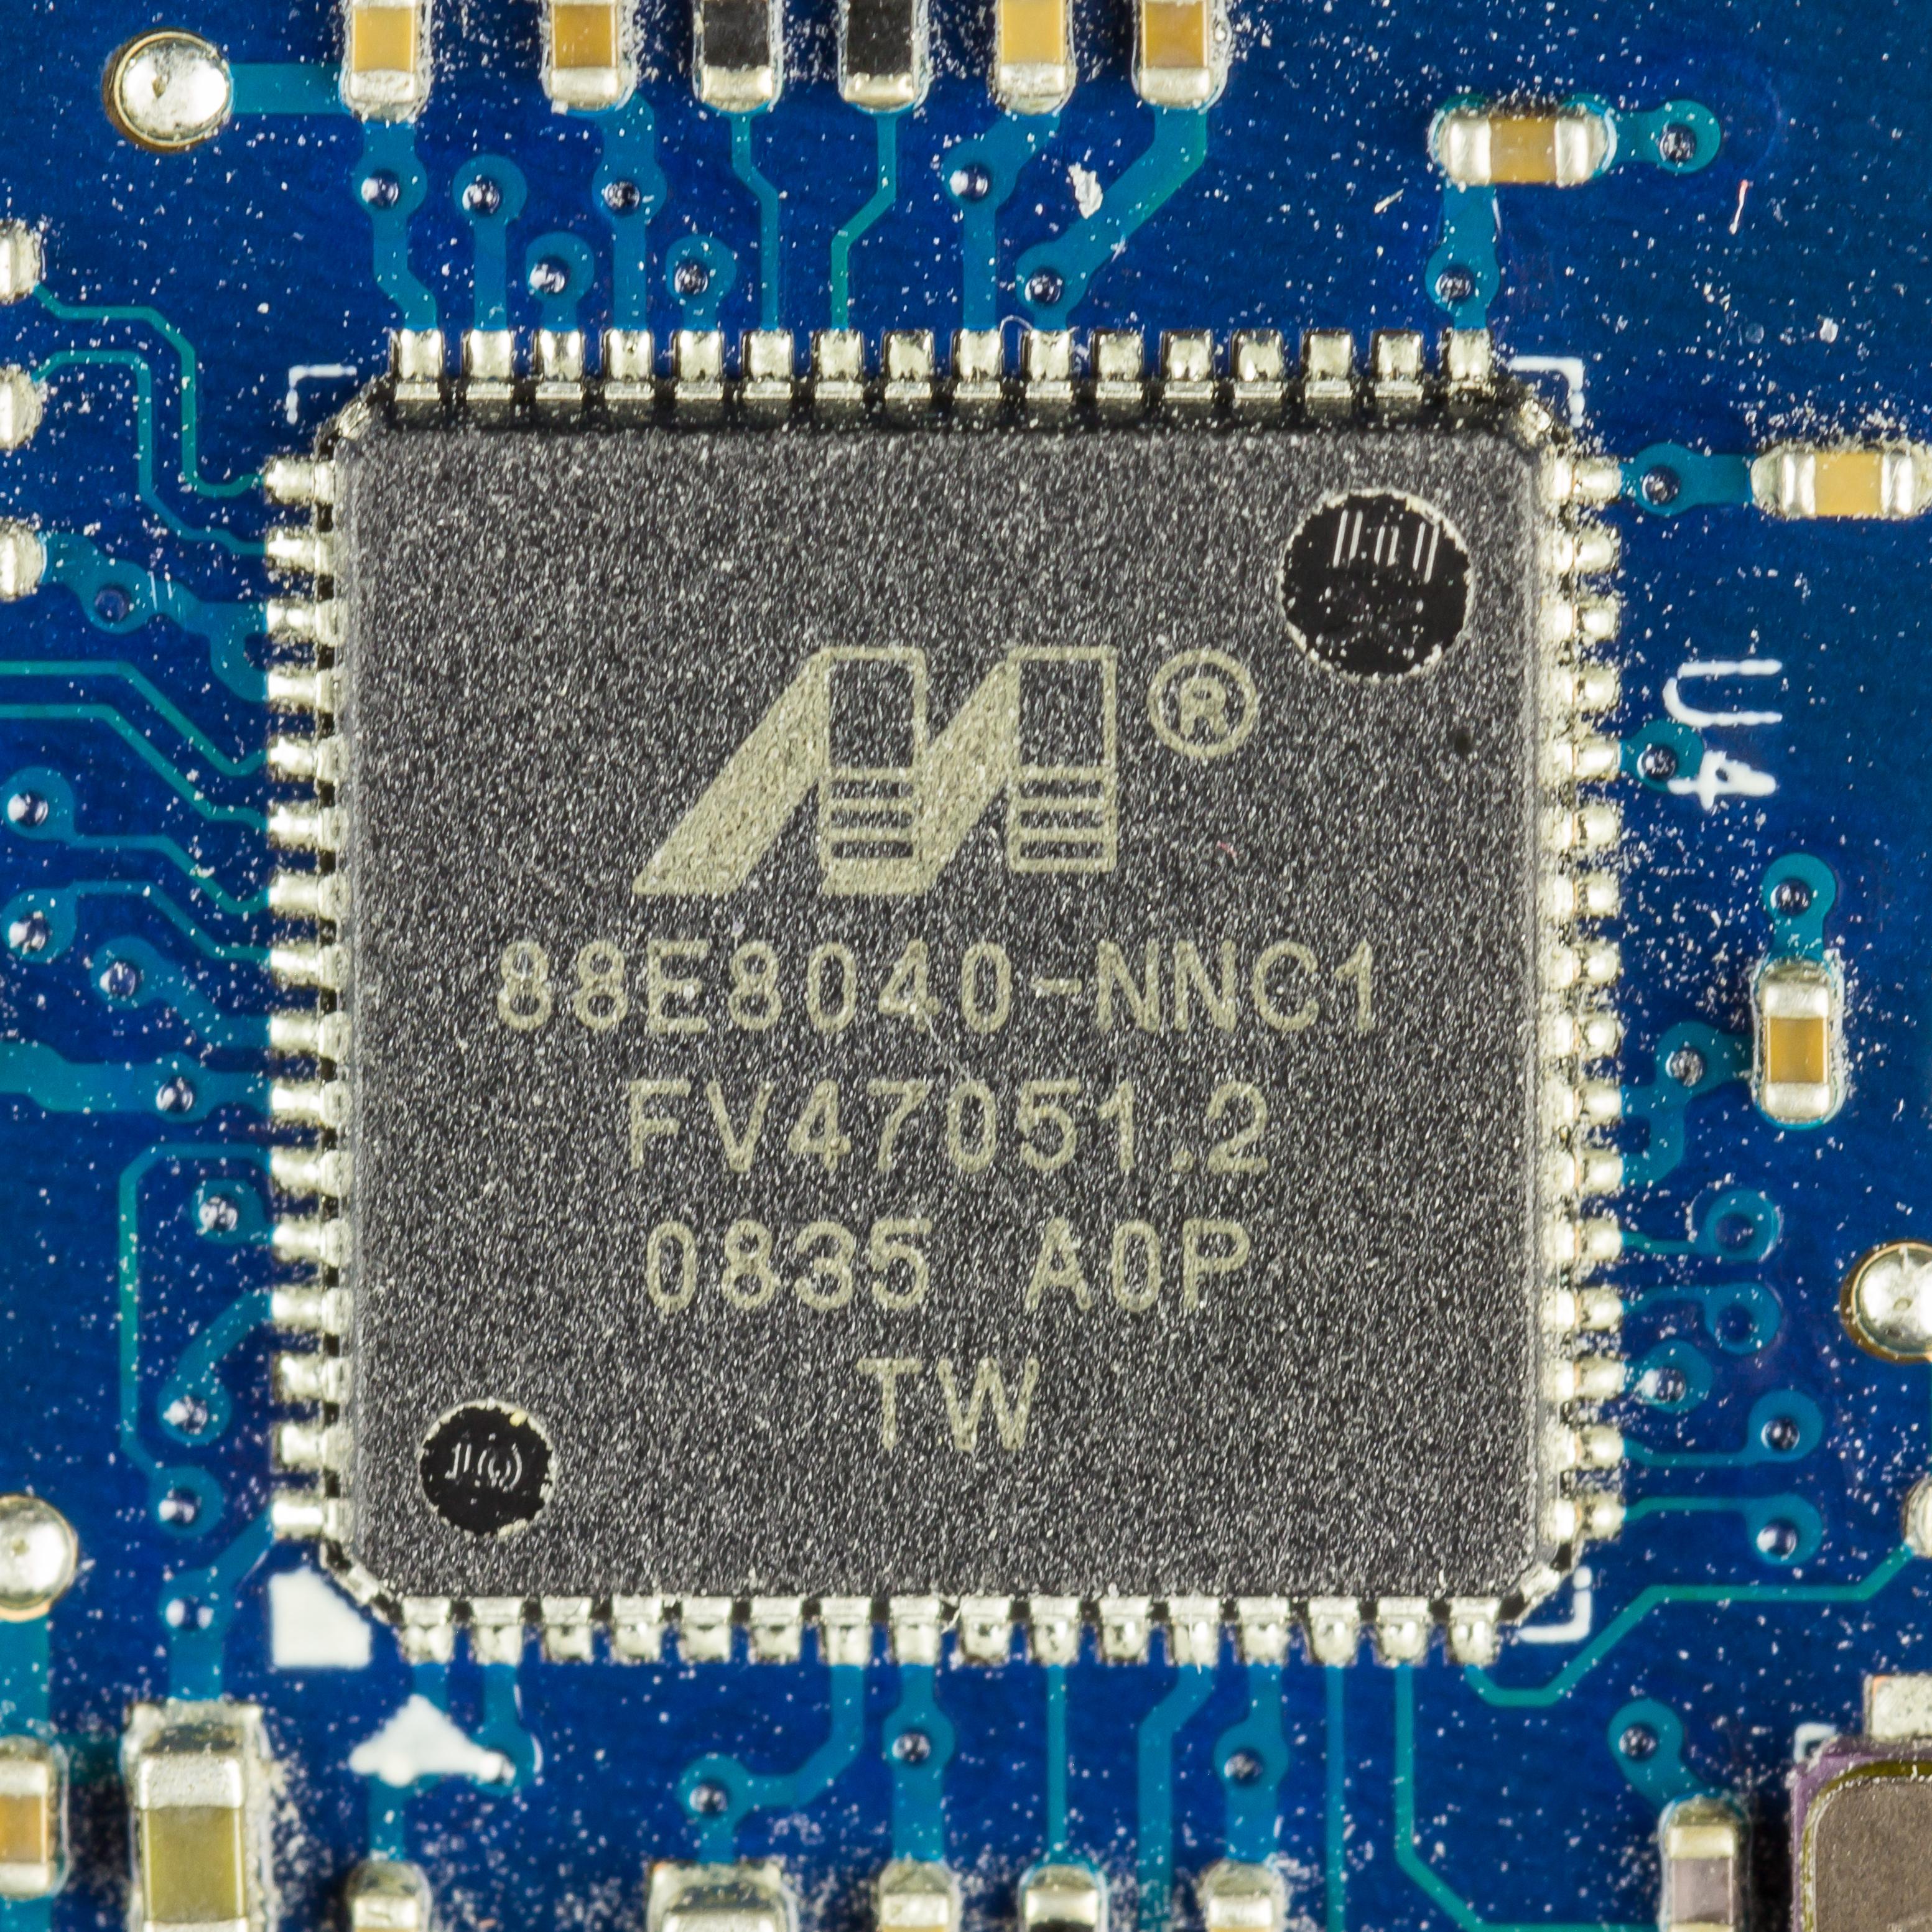 Samsung NC10 - motherboard - Marvell 88E8040-NNC1-1276.jpg English: Samsung NC10 - motherboard - Marvell 88E8040-NNC1 Date 31 May 2018 19:36:06